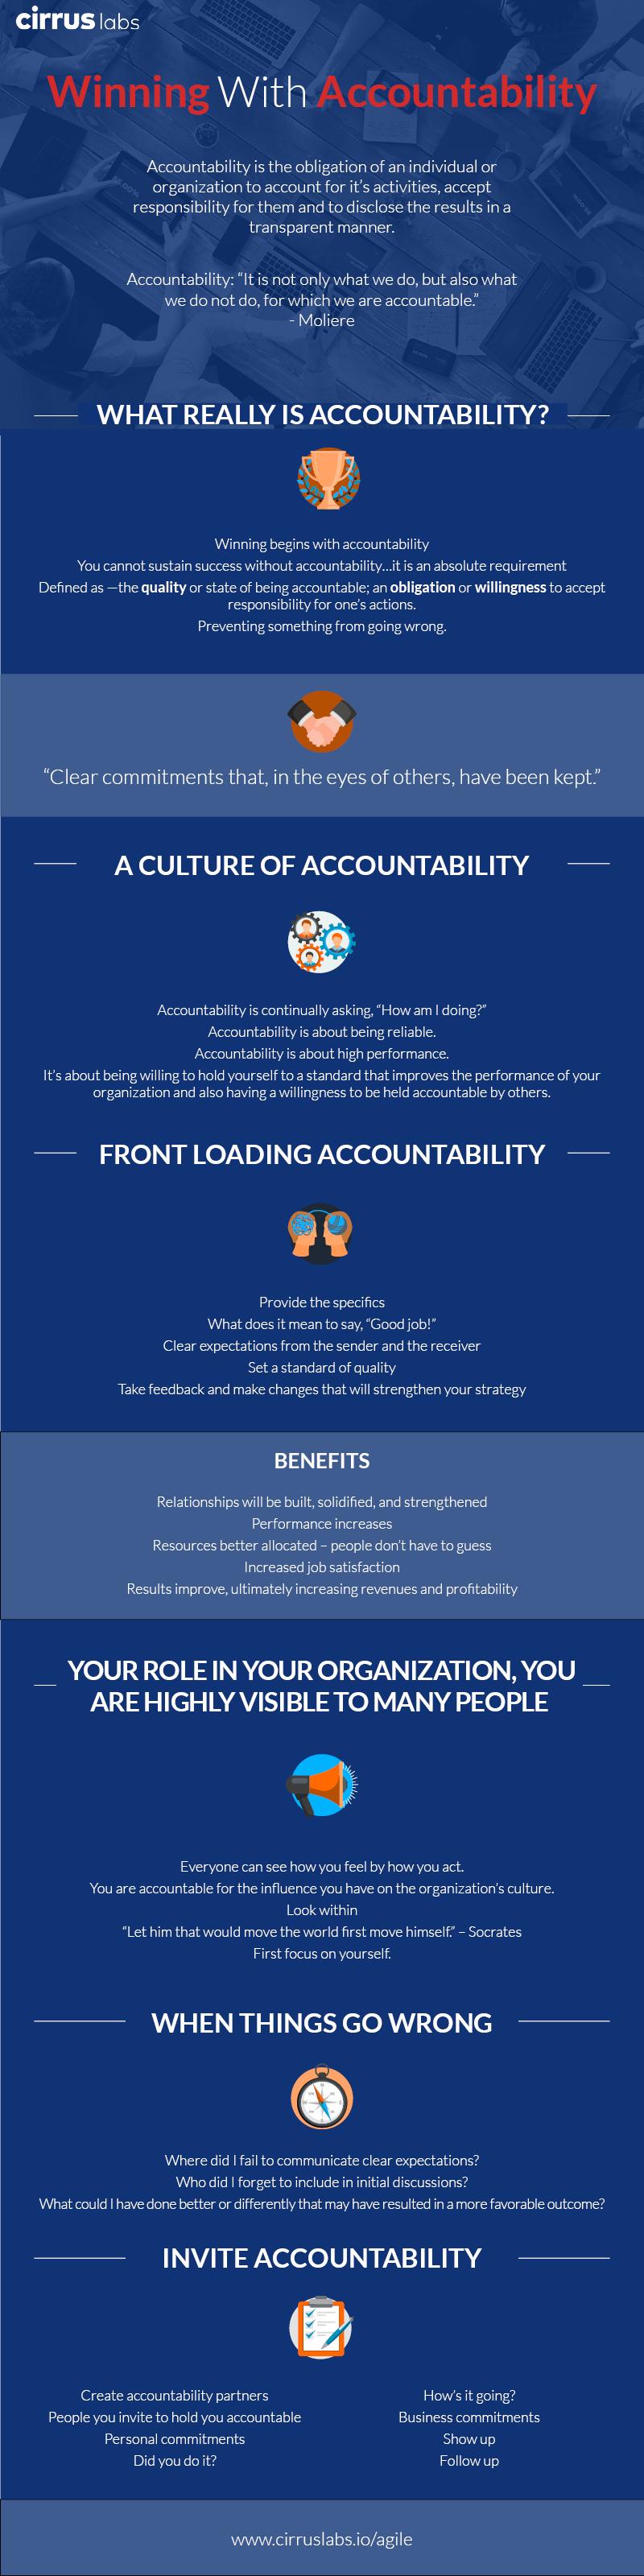 Accountability_winning